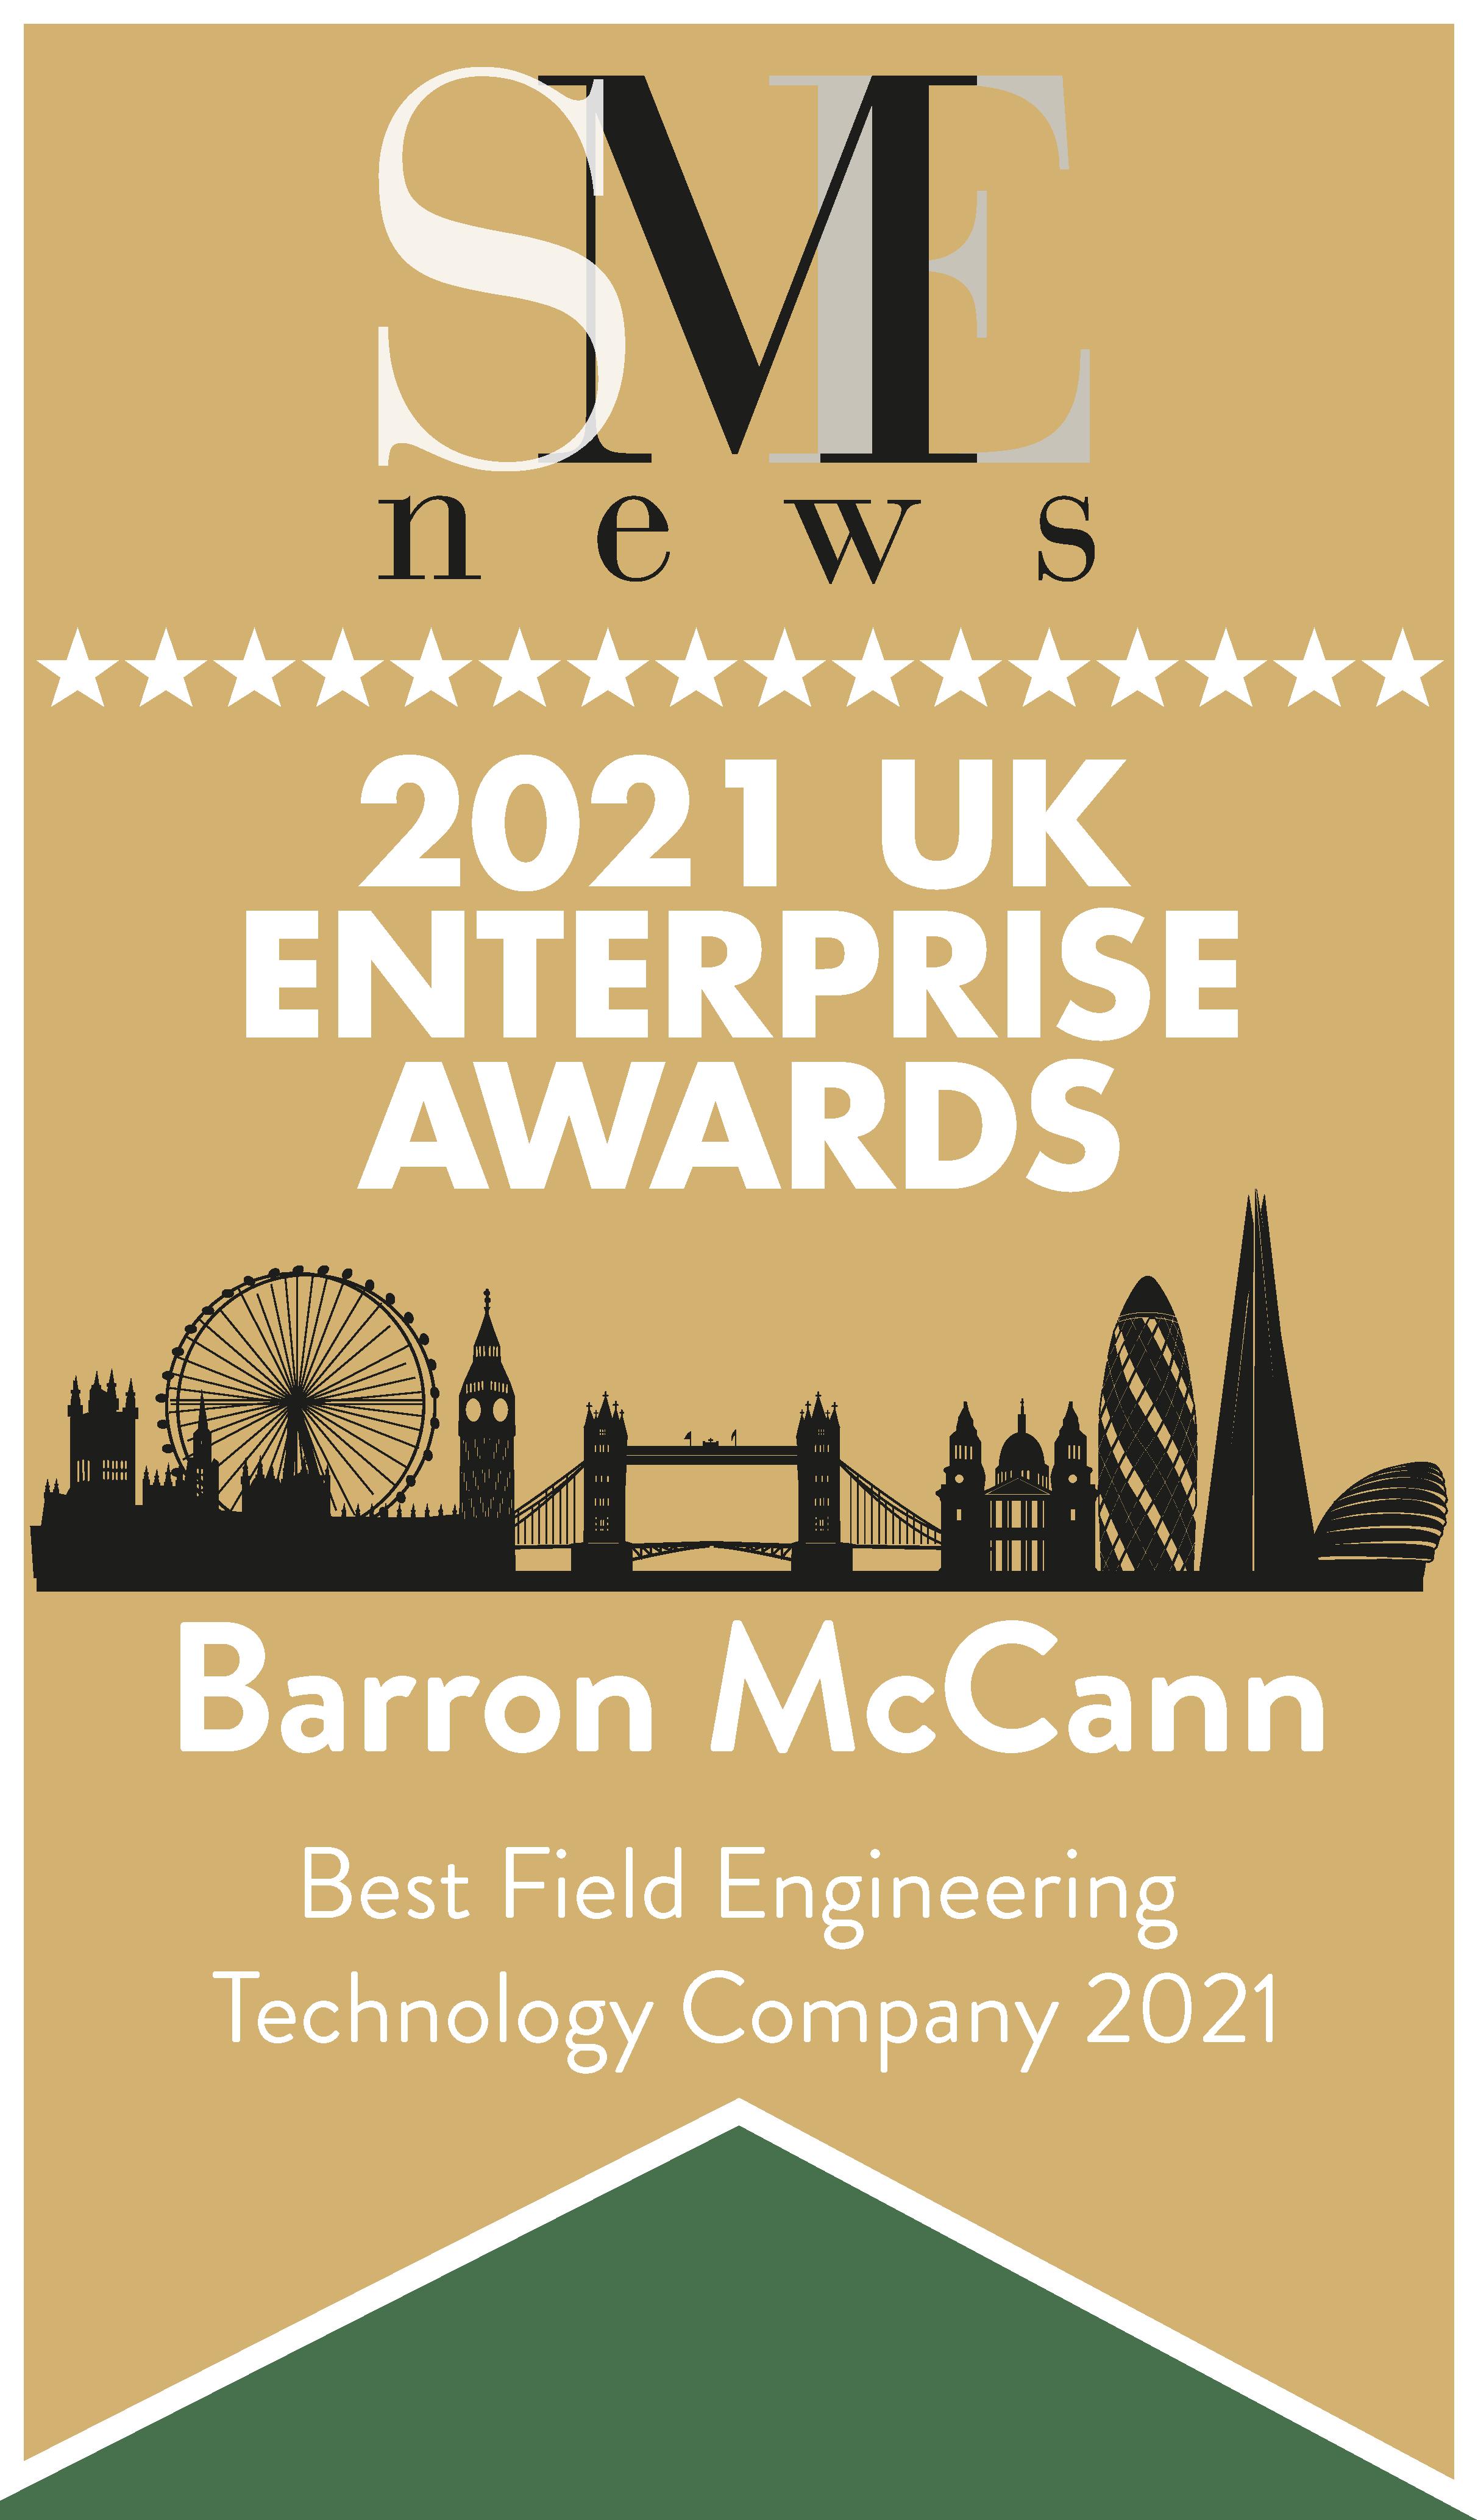 Barron McCann - Award-Winning Field Engineering Services